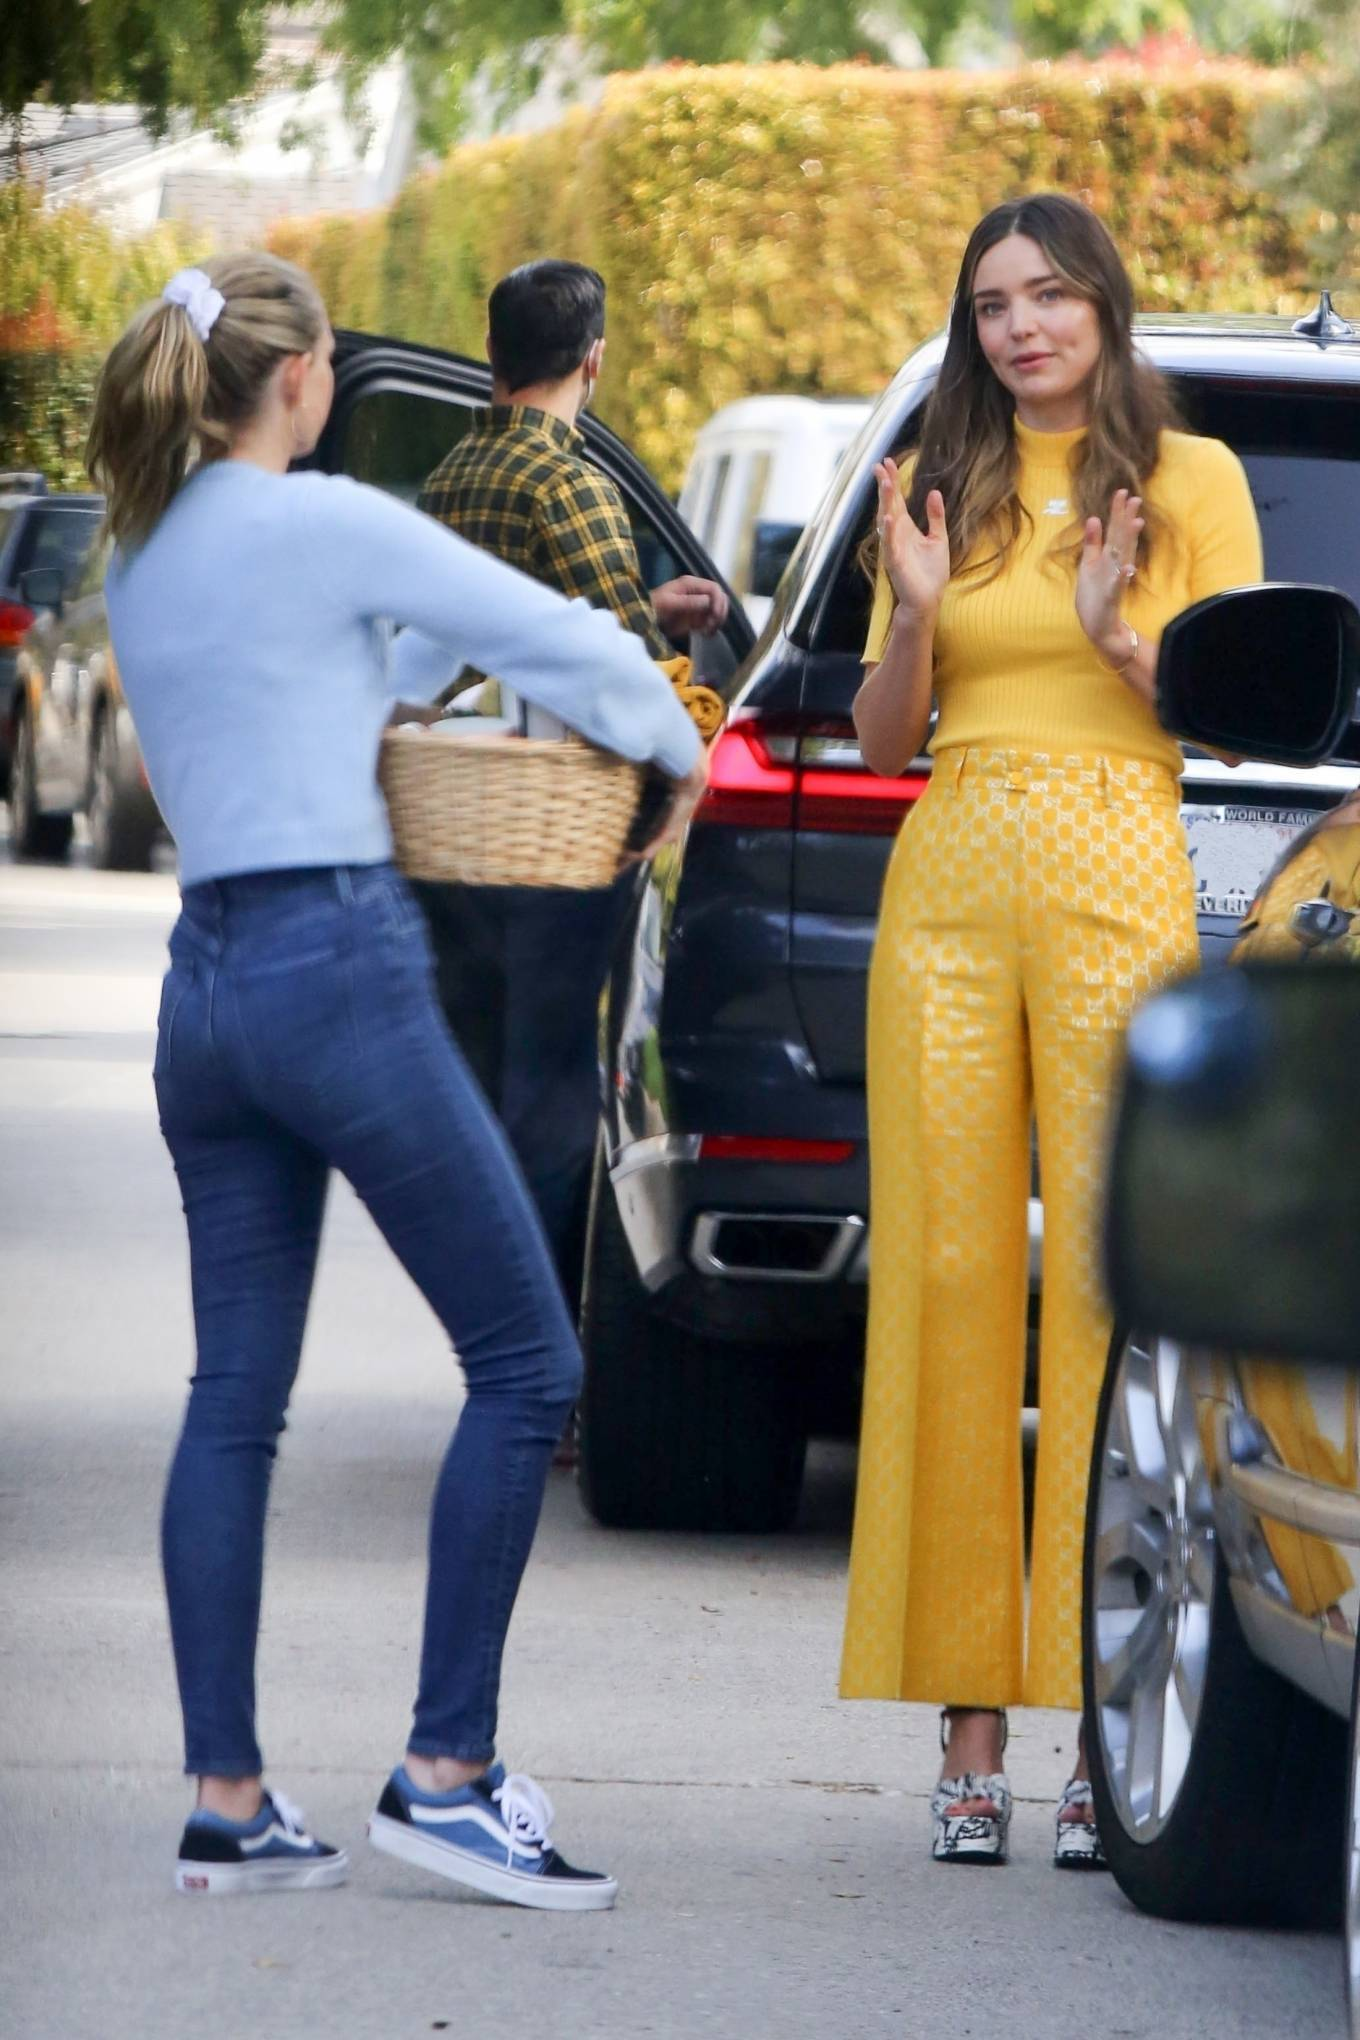 Miranda Kerr - With Kate Hudson and Sara Foster - KORA Organics products presentation in Los Angeles